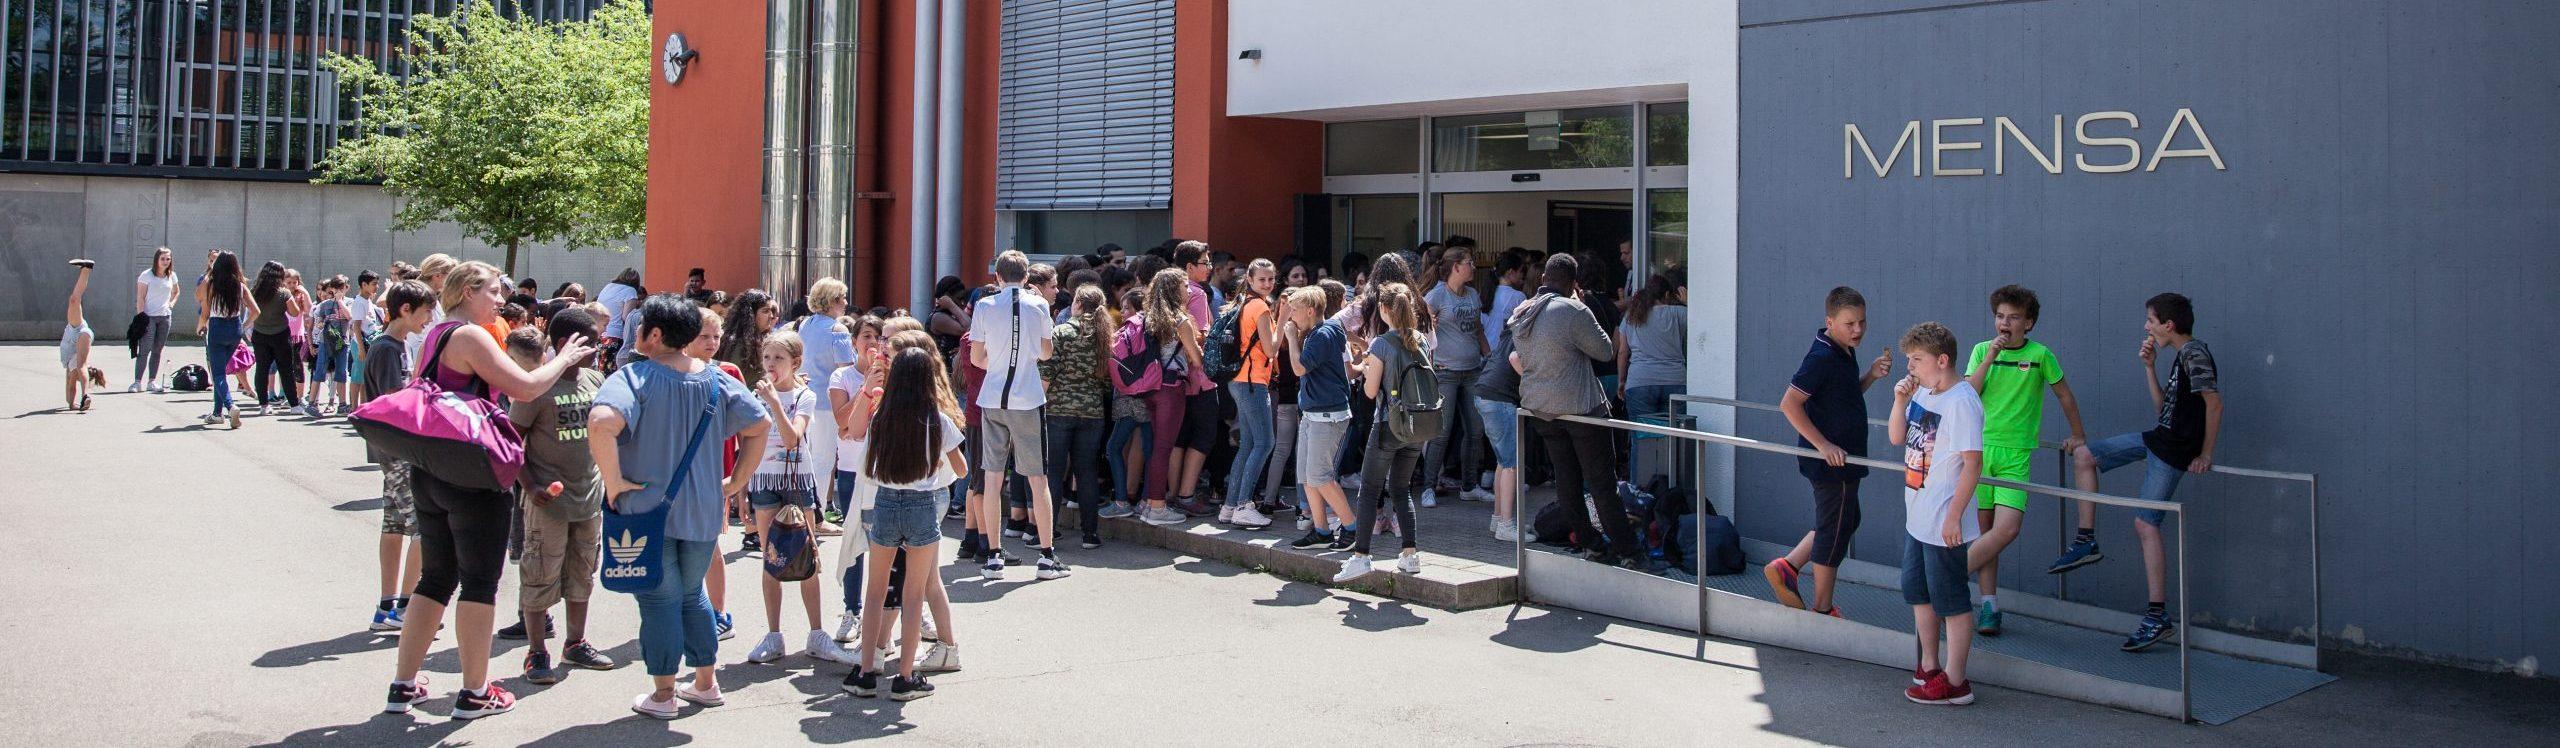 Schüler vor dem Mensa Eingang